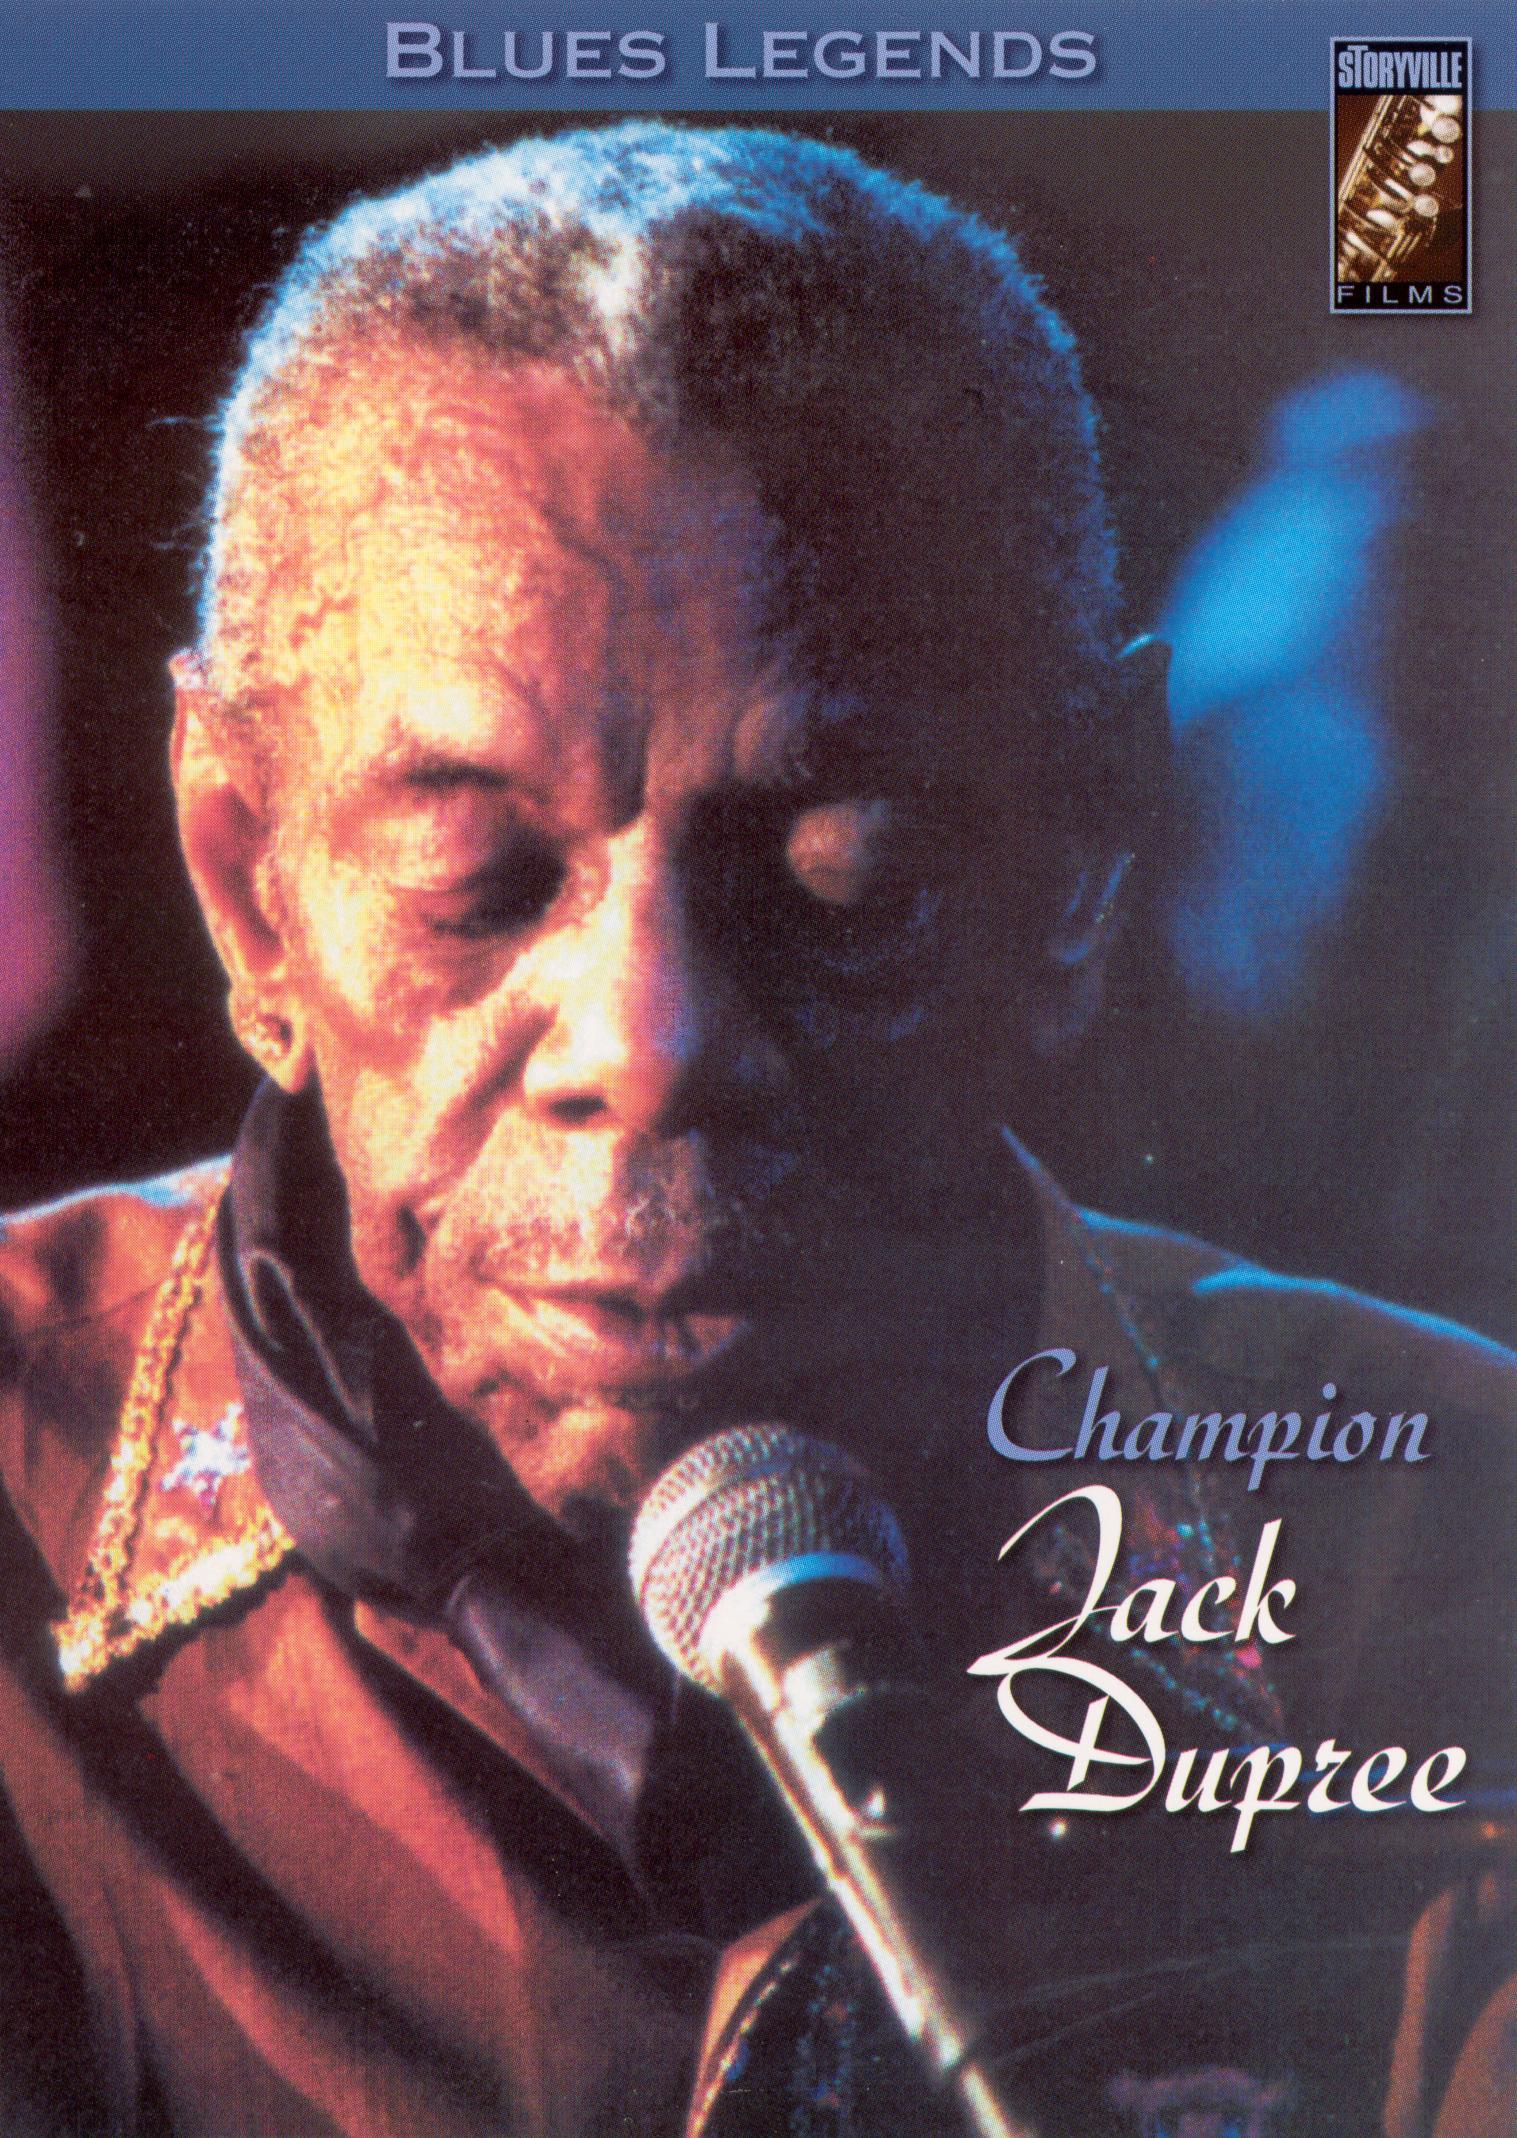 Blues Legends: Champion Jack Dupree